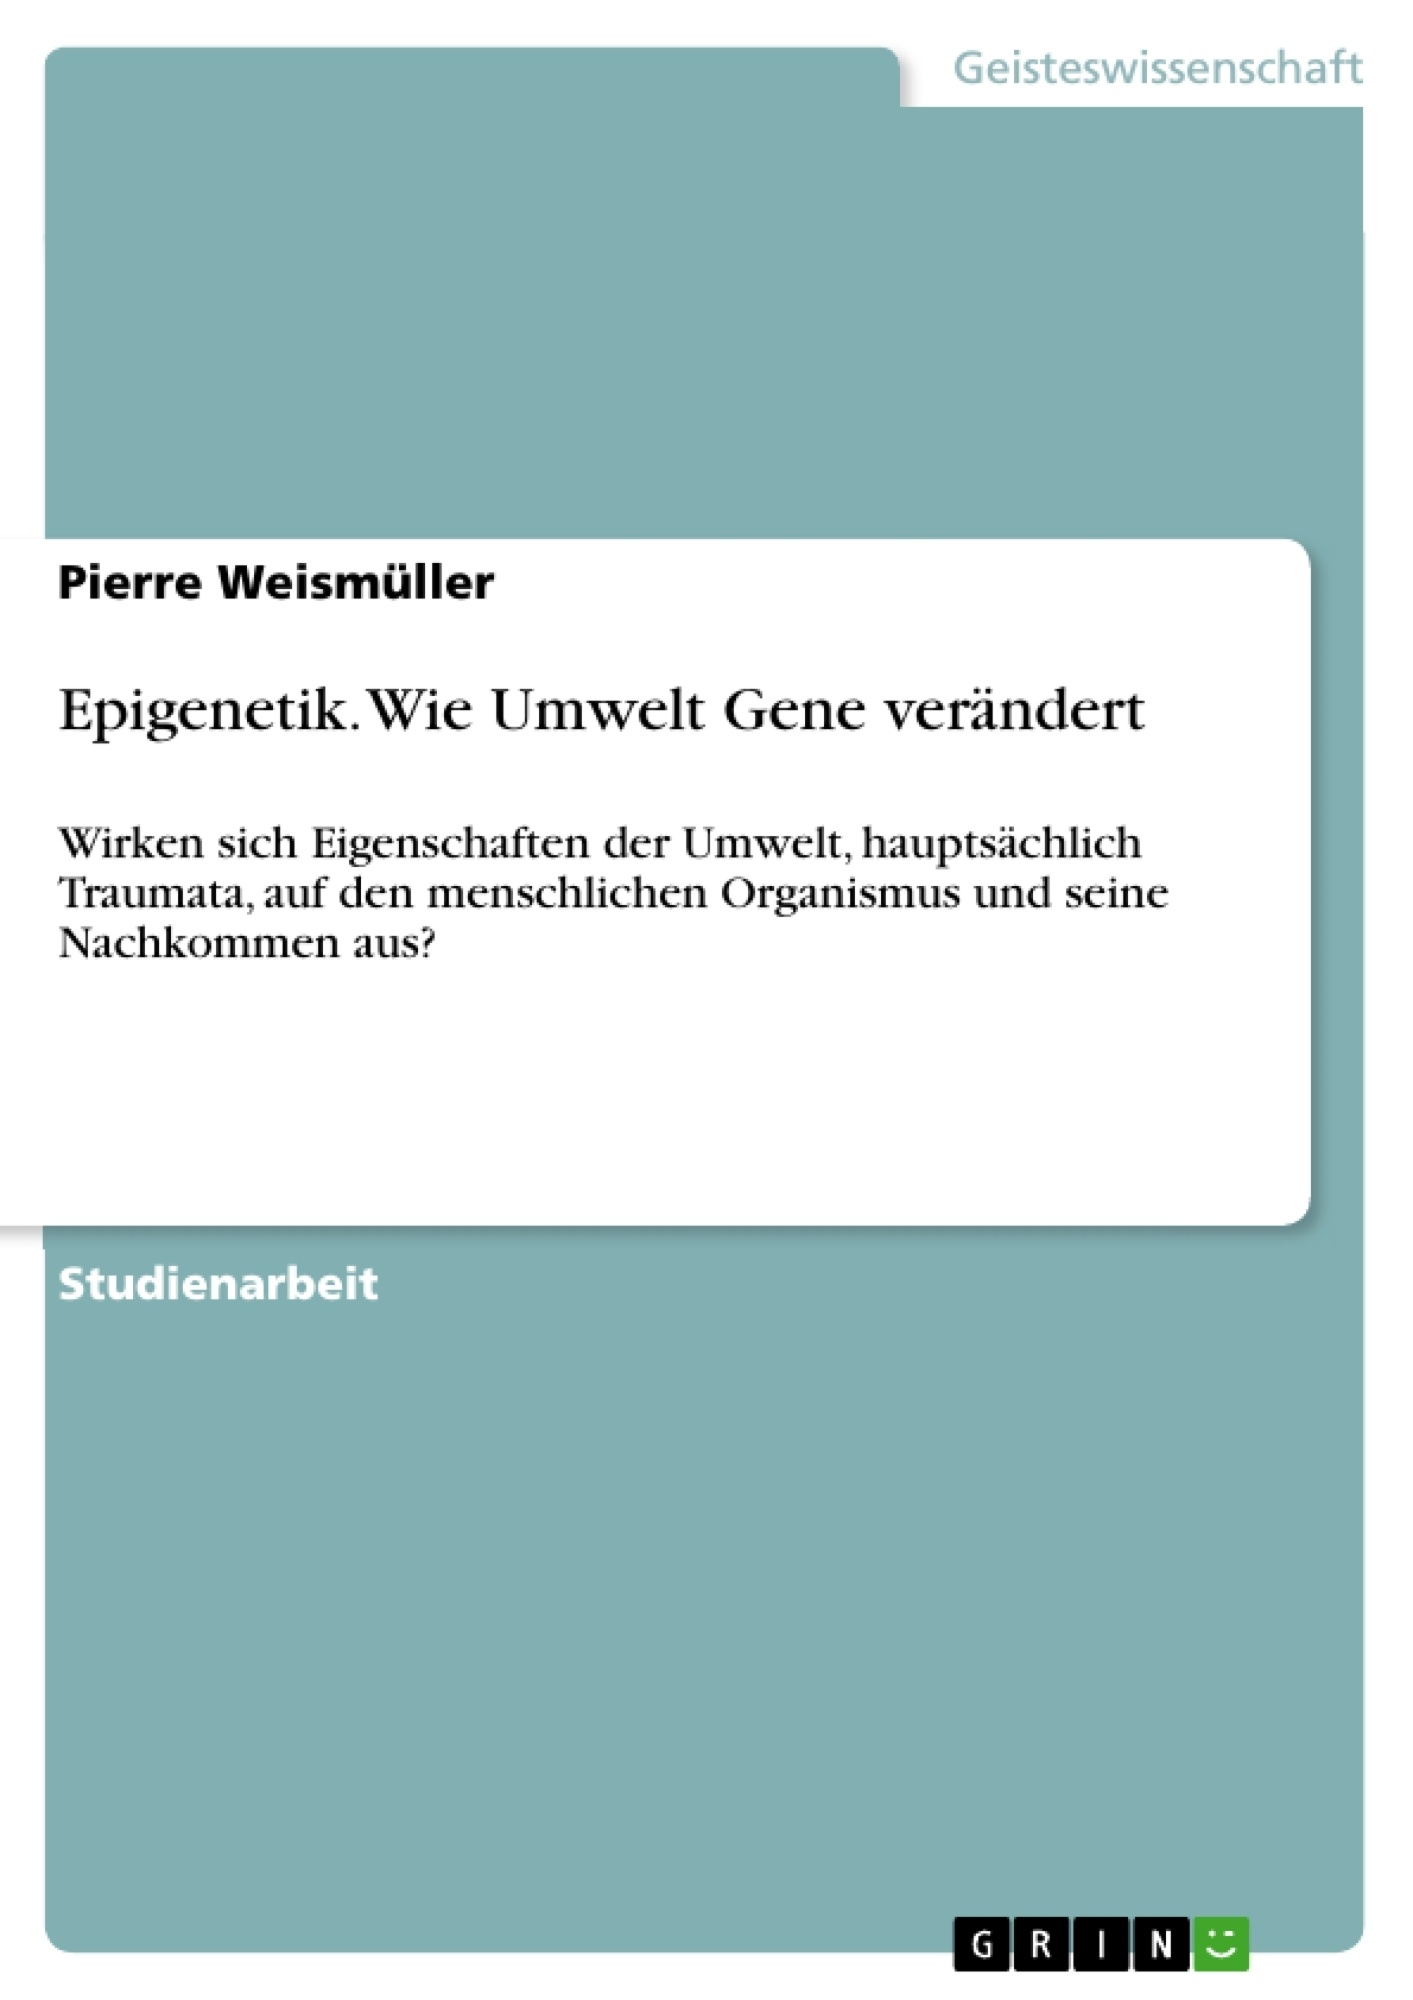 Titel: Epigenetik. Wie Umwelt Gene verändert